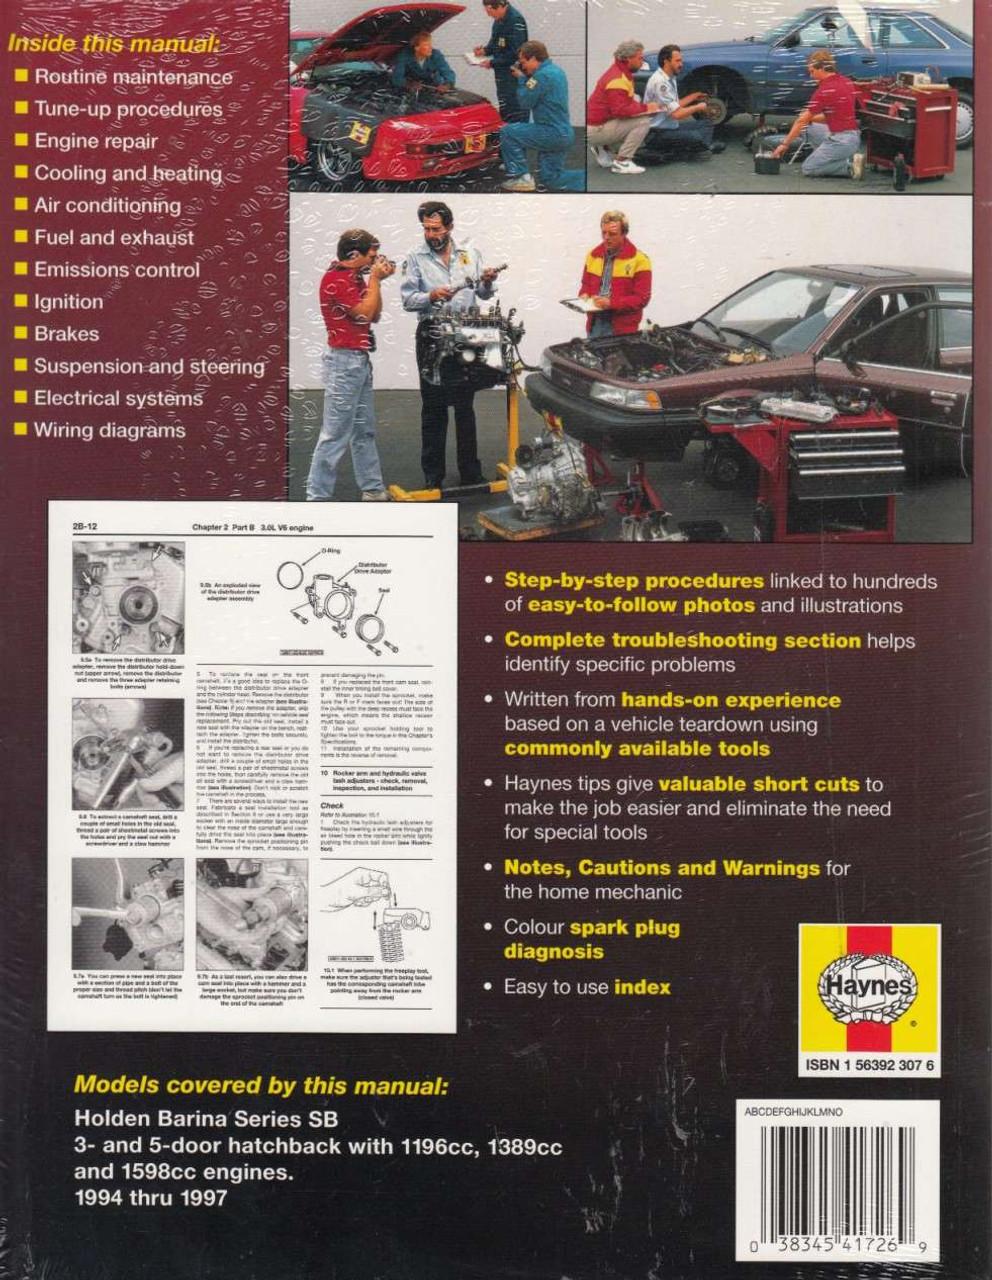 Sb Barina Wiring Diagram Free Download 2004 Holden Stereo Series 1994 1997 Workshop Manual